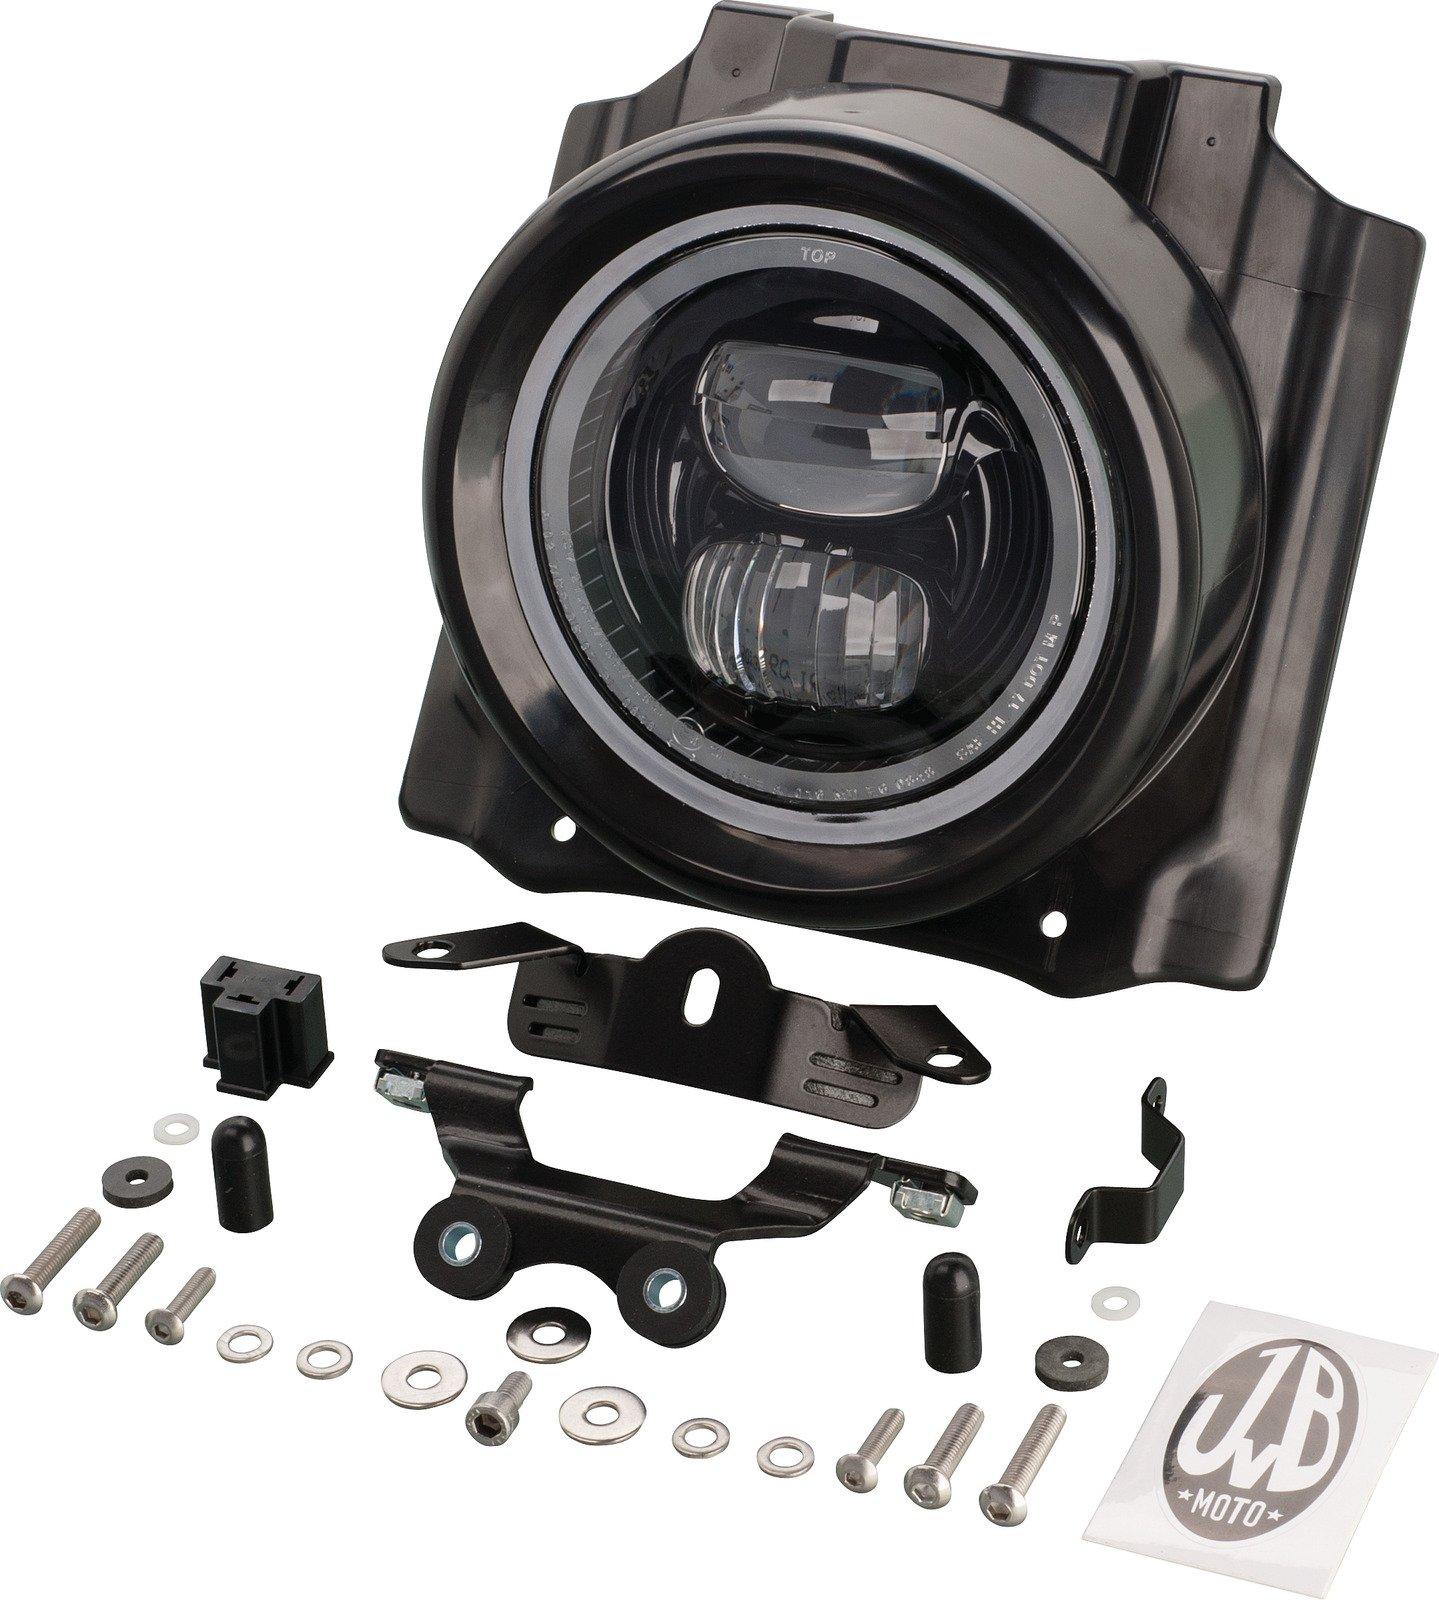 JvB-moto 'Super7' ABS Headlight Cover LED 4-094